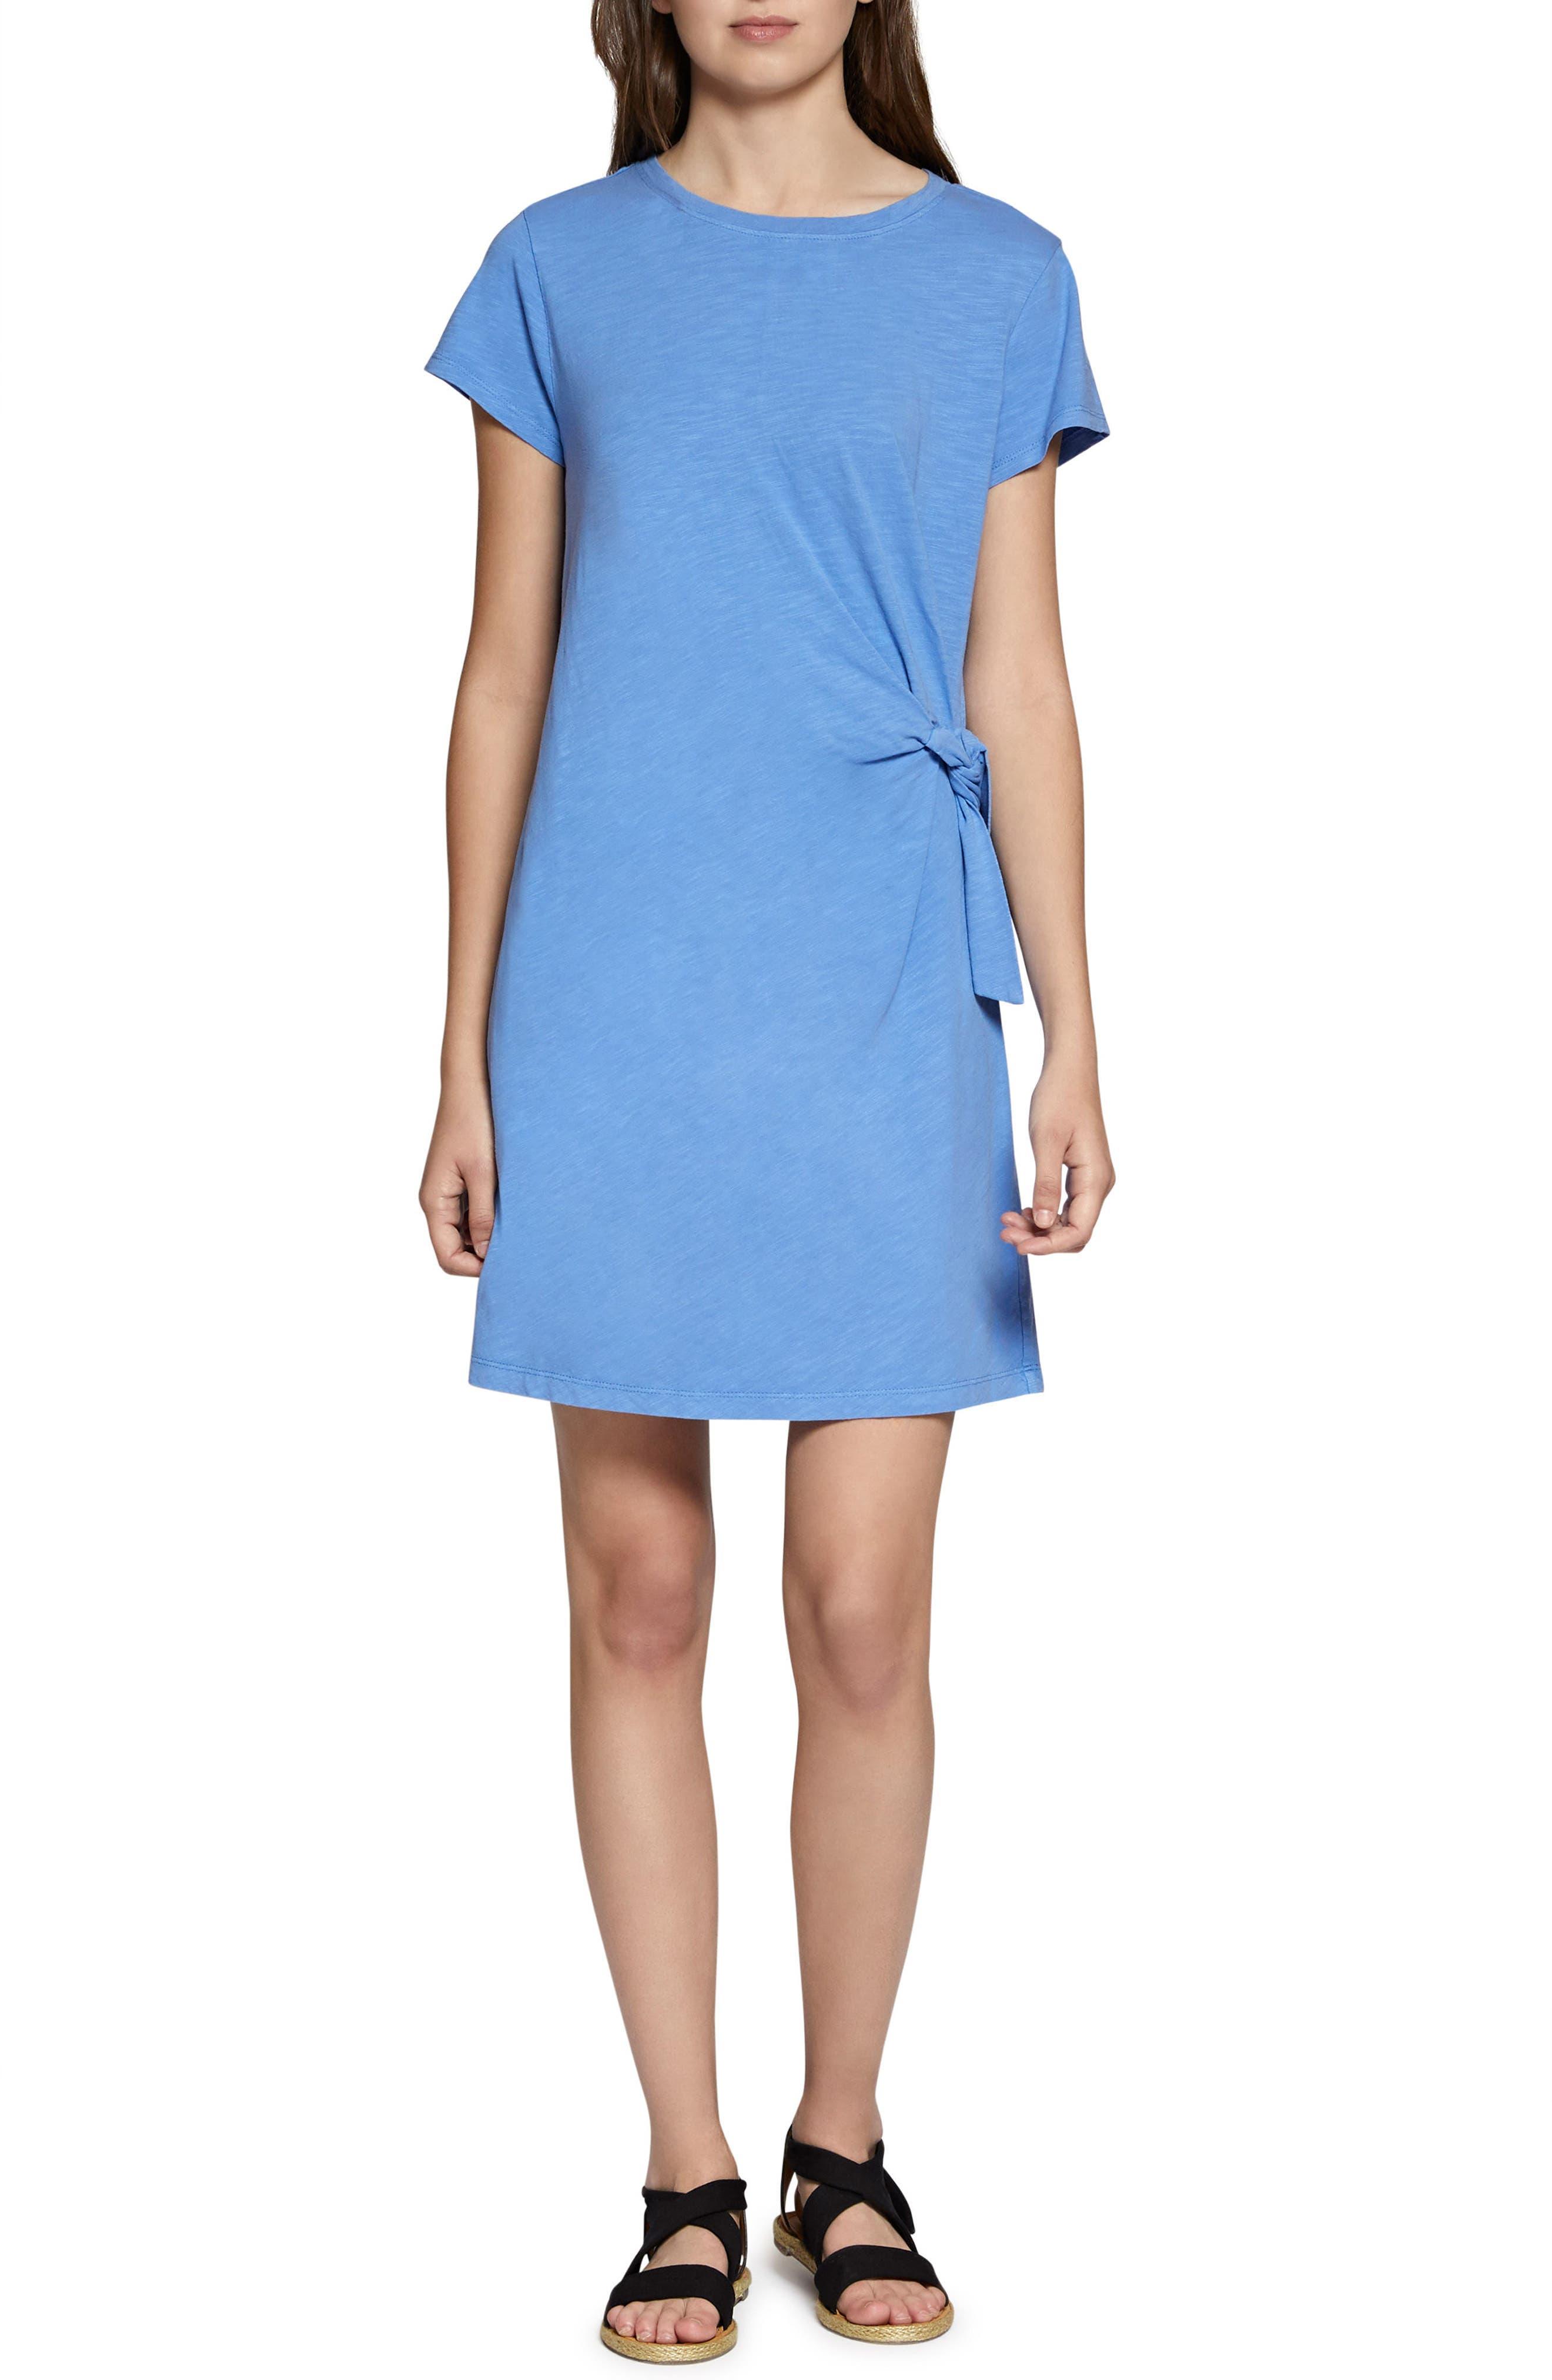 Wrapsody Dress,                             Main thumbnail 3, color,